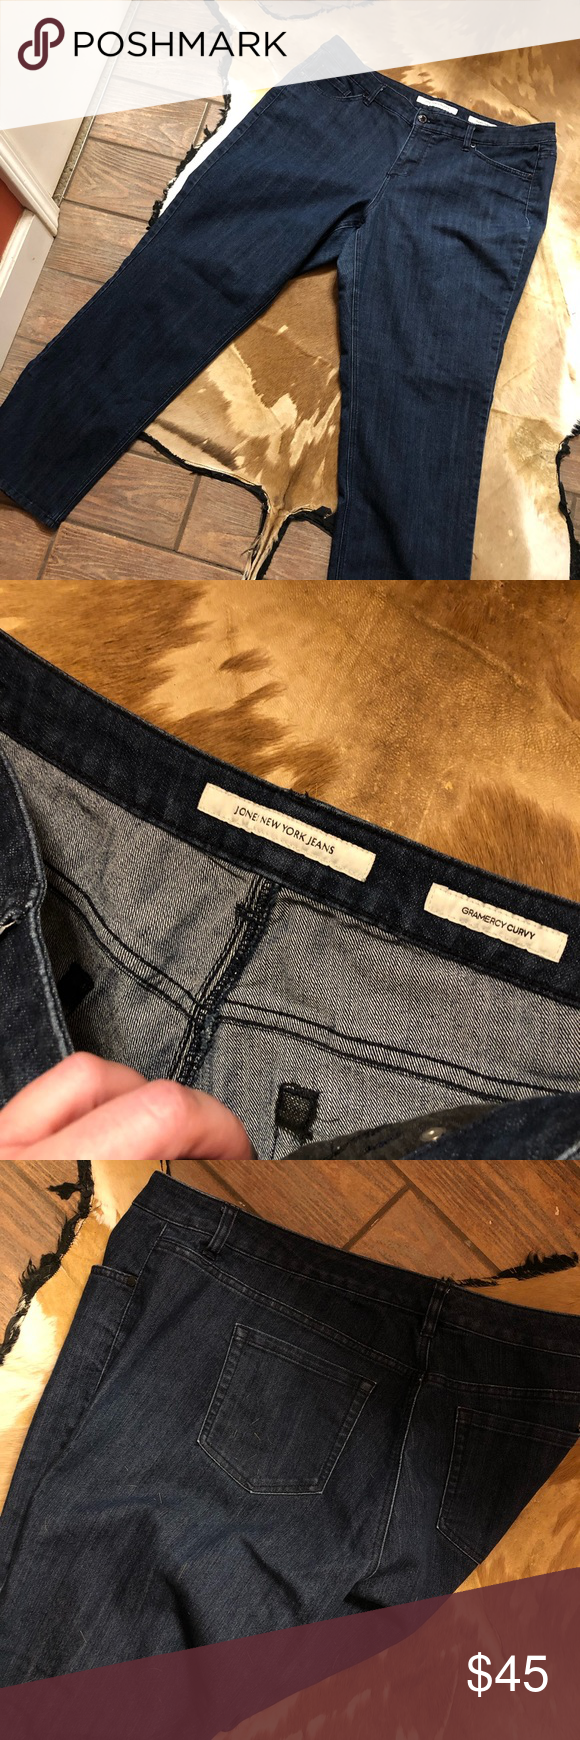 Jones New York 18w Jeans 🧜♀️ Jones new york, Fashion